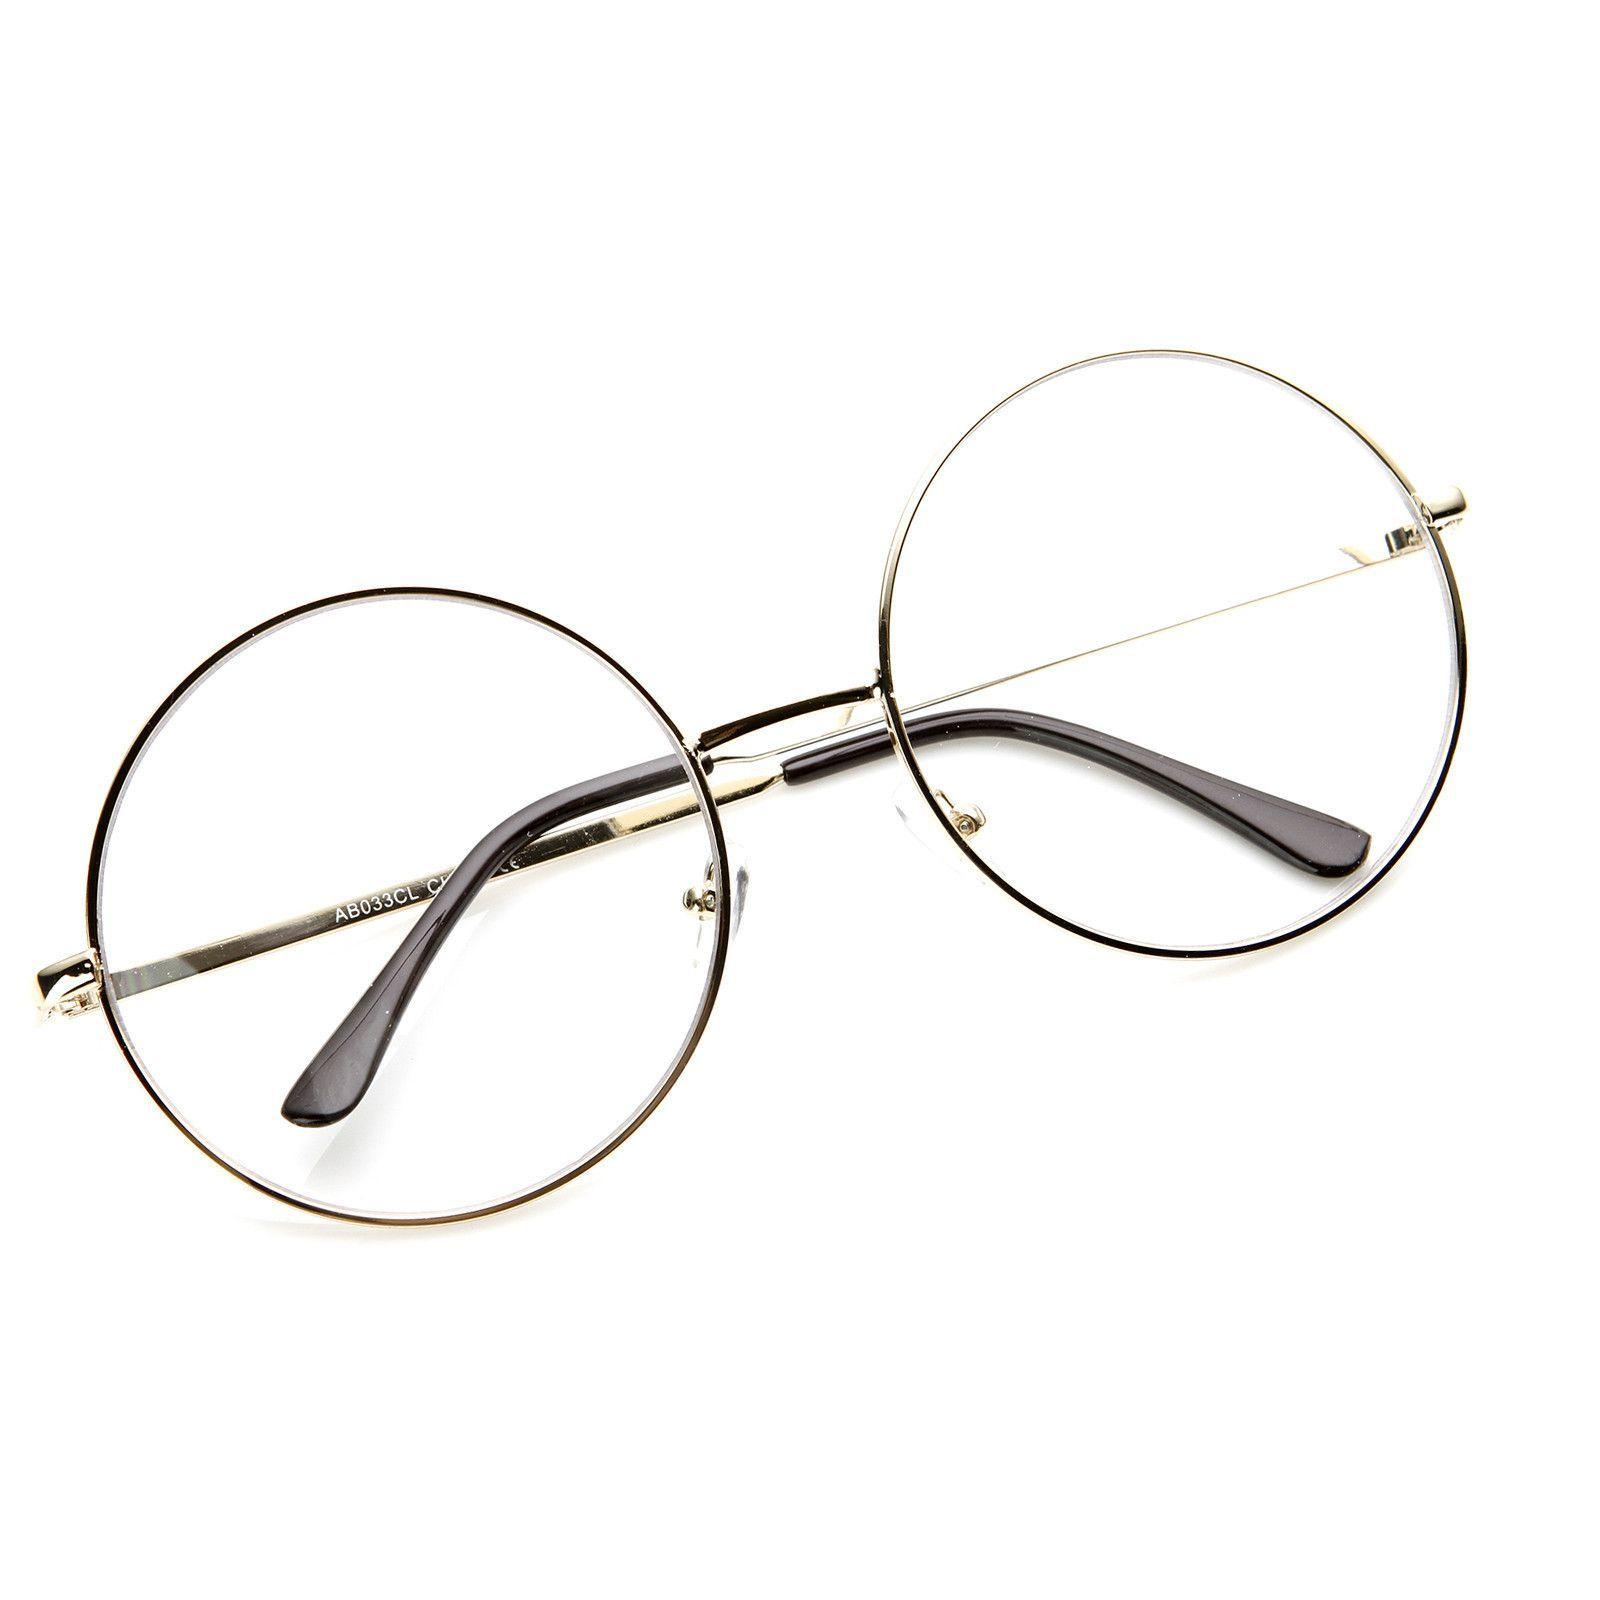 ce9bffbc279 Vintage Era Super Large Round Circle Metal Clear Lens Glasses 8714 ...